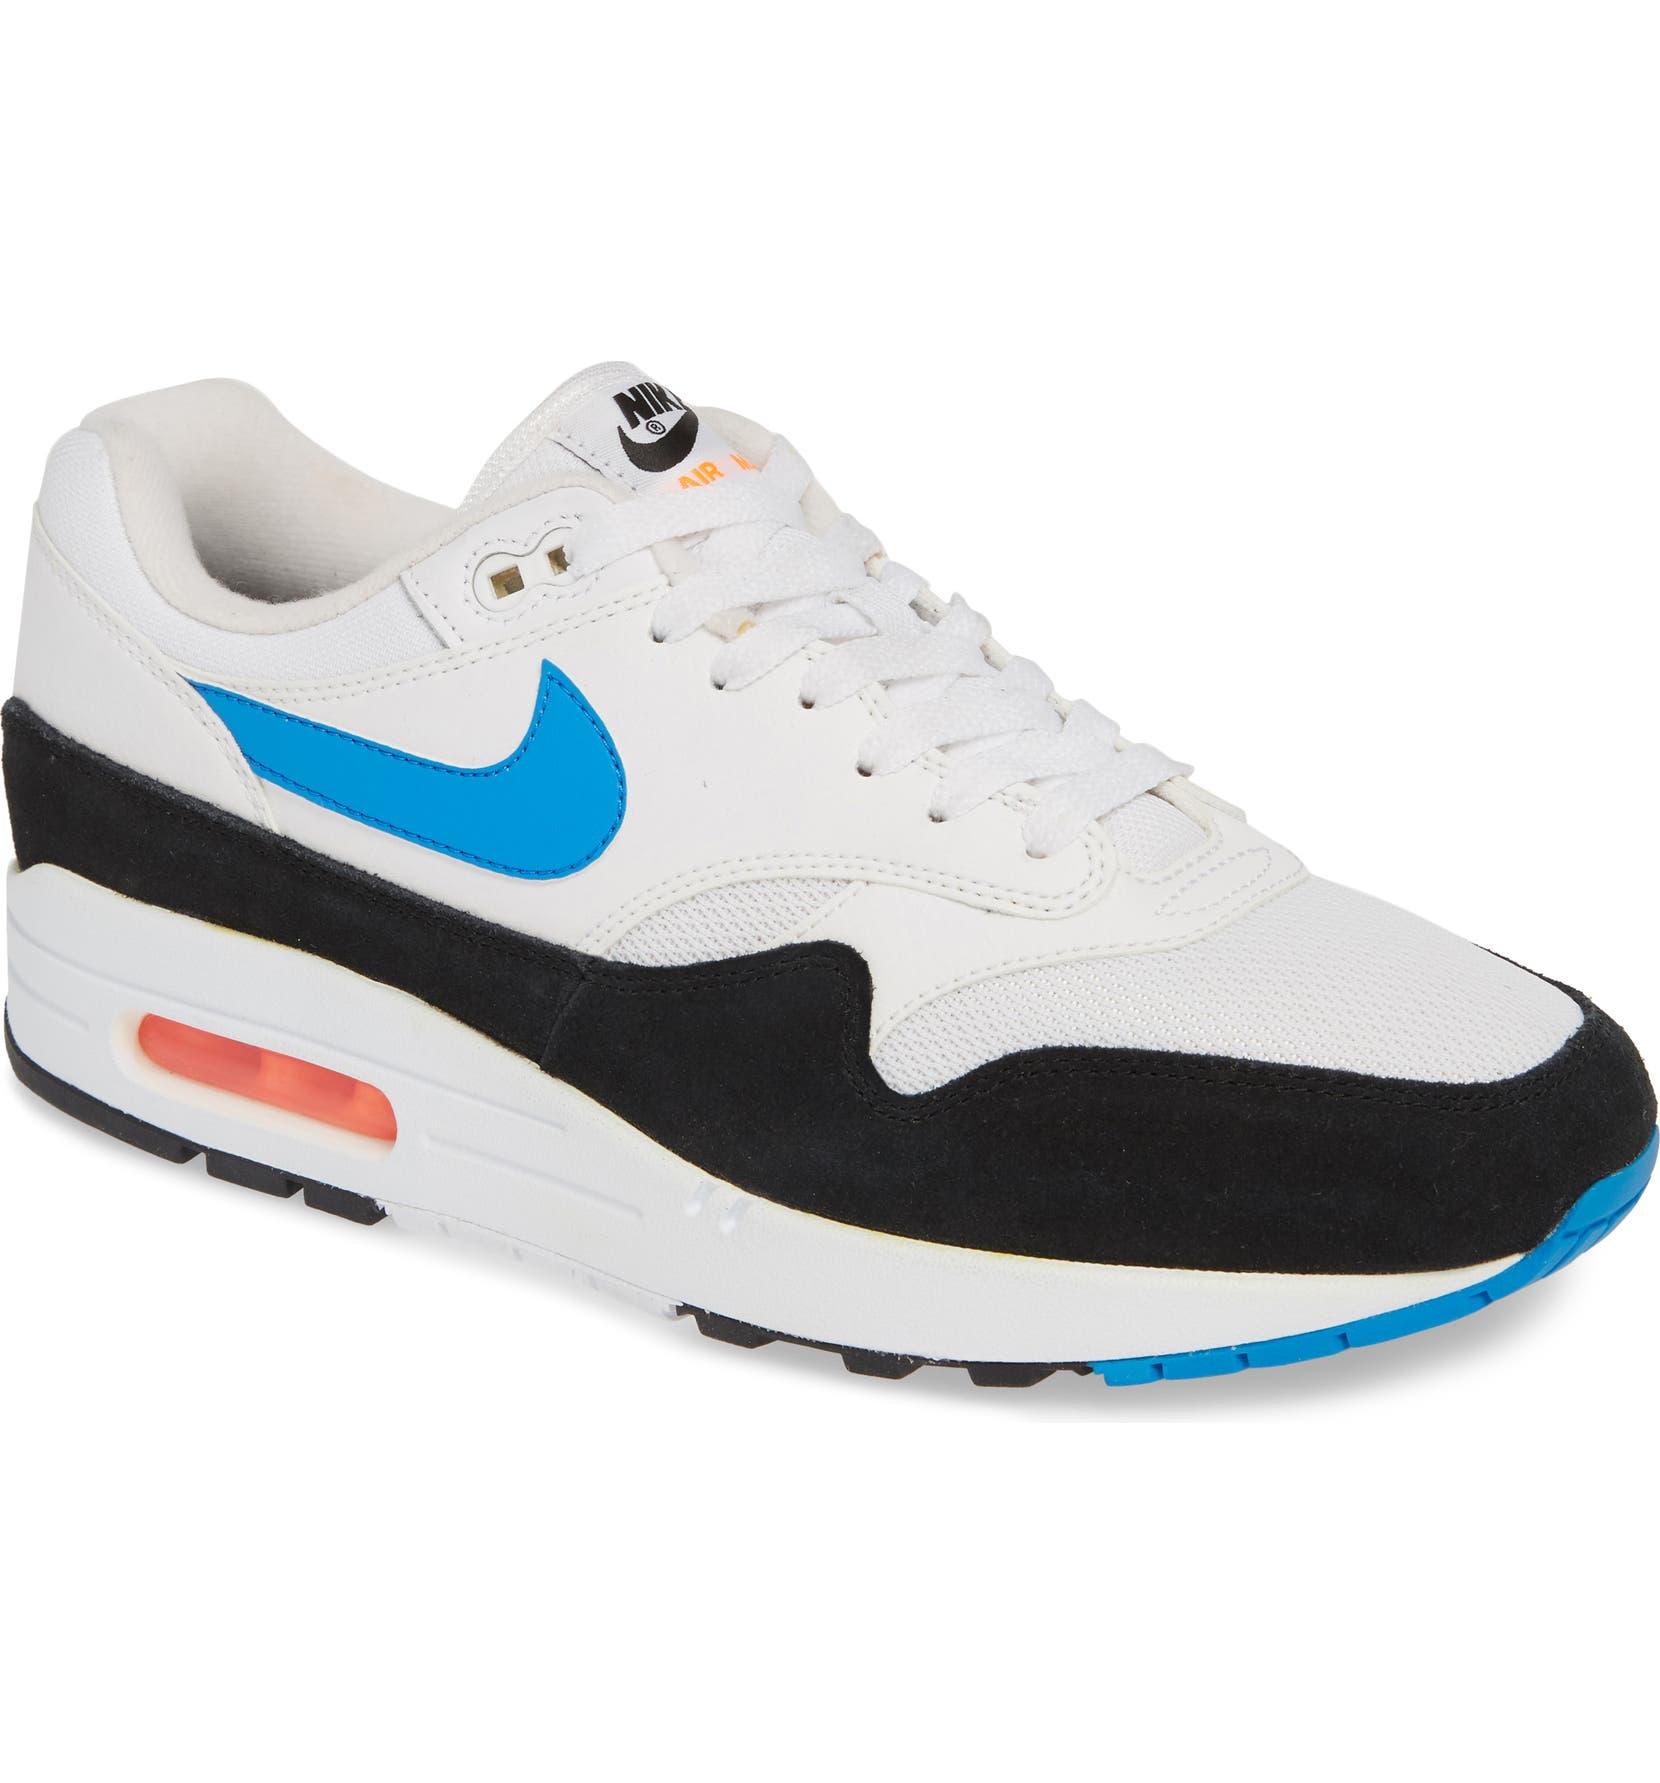 1 Nike SneakermenNordstrom Air Max Nike mvN0y8wnO